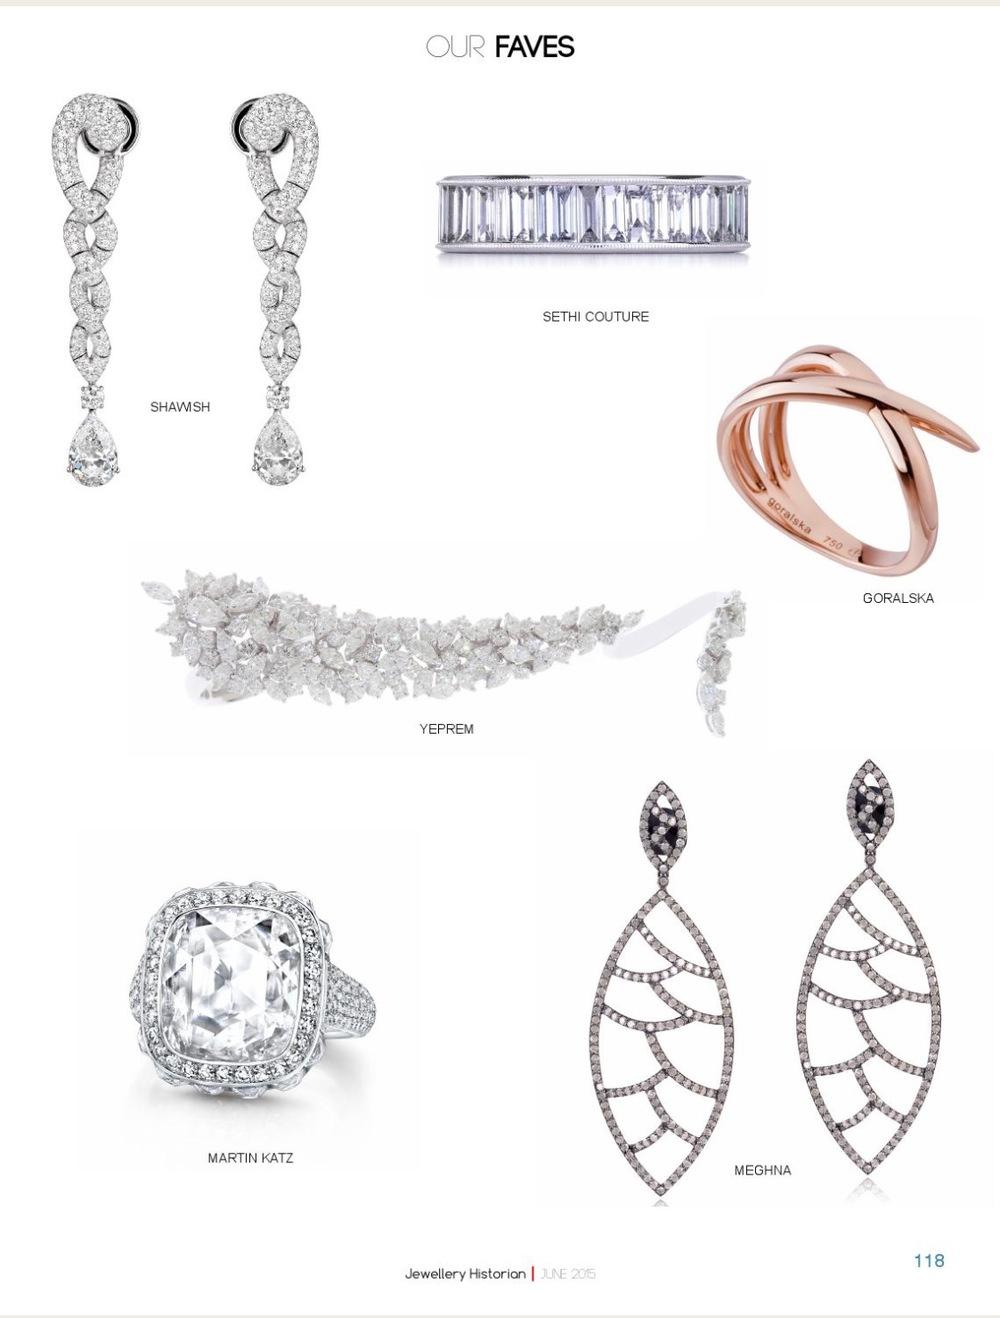 Jewellery Historian.jpg